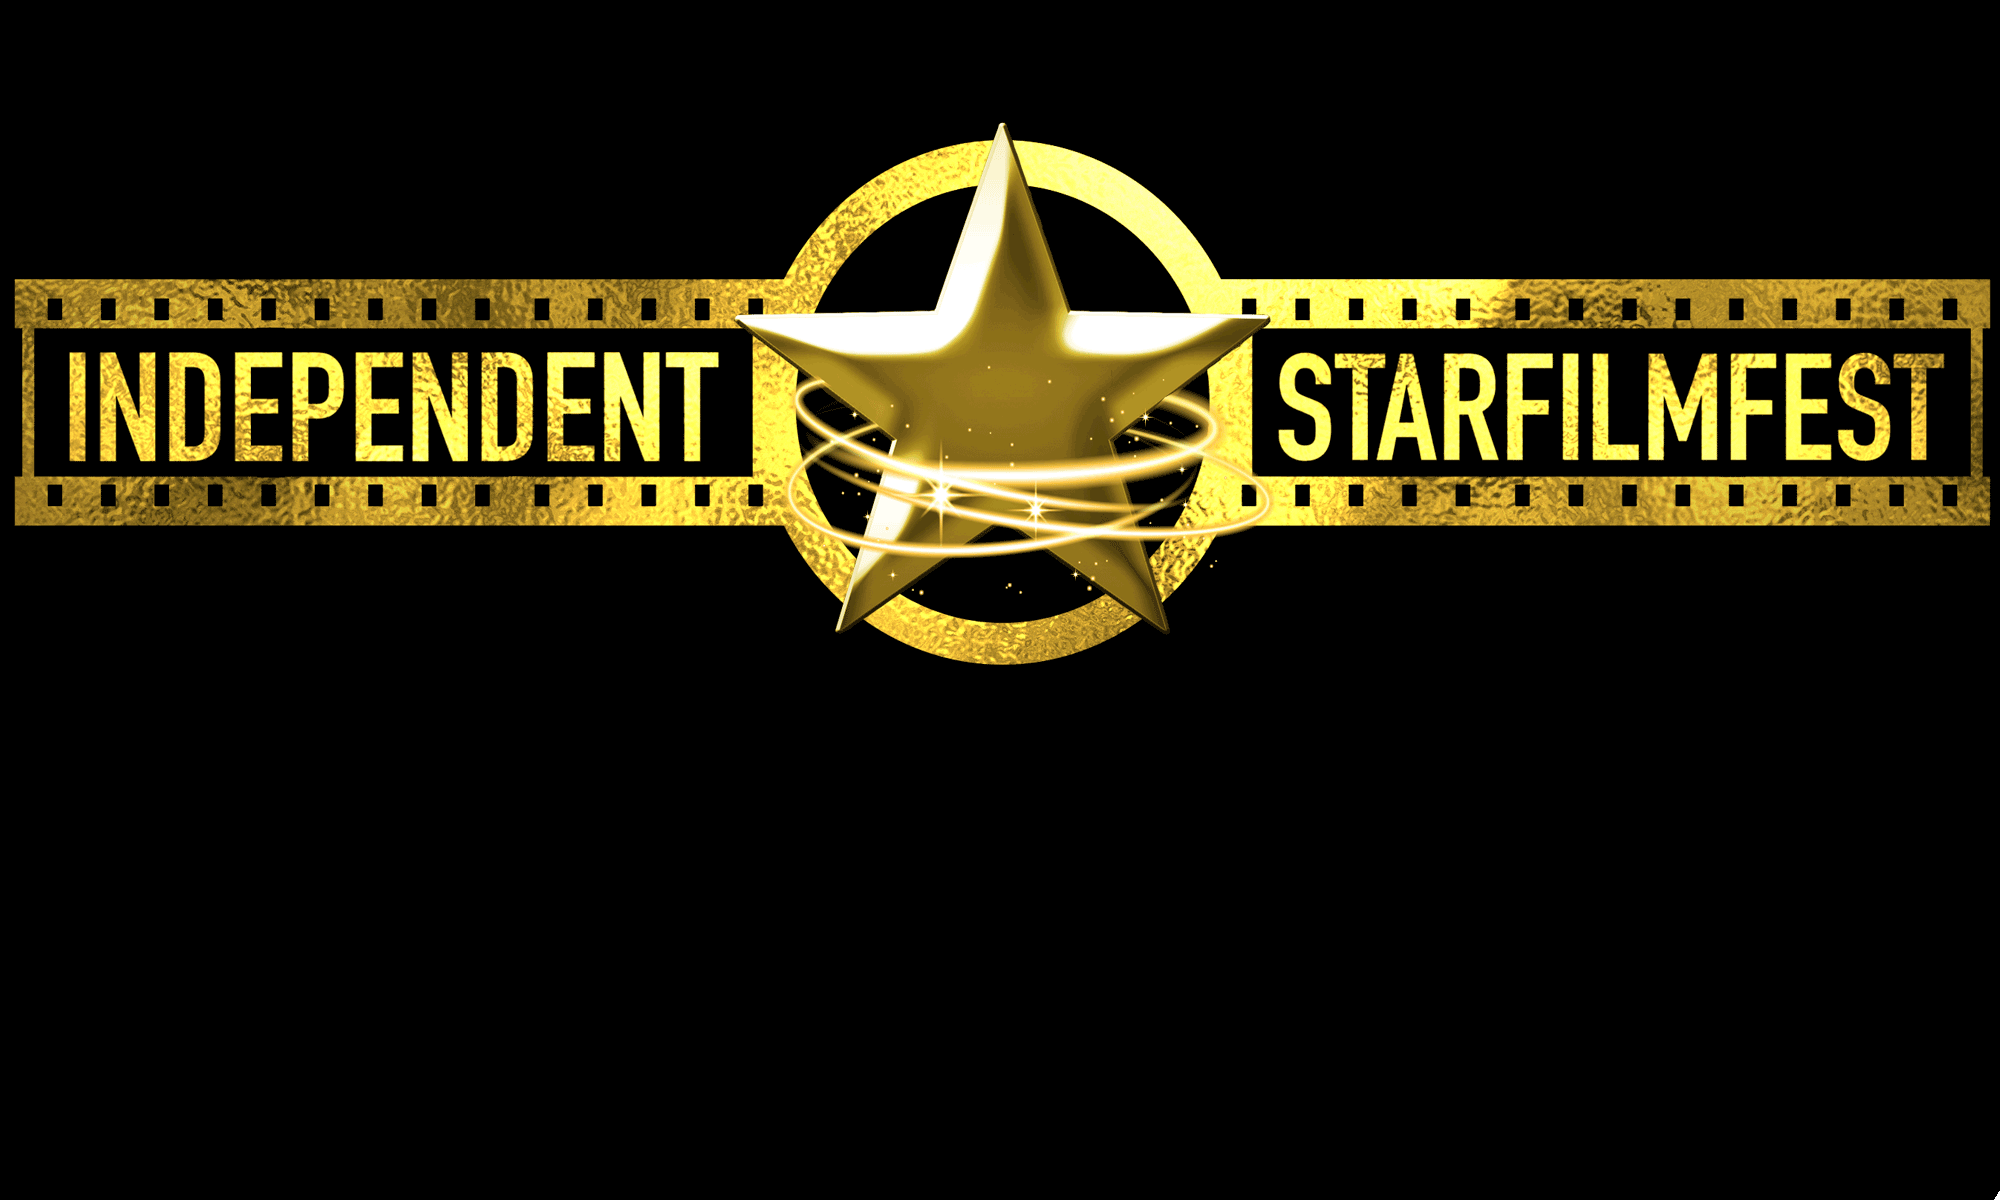 IndependentStarFilmfest.com